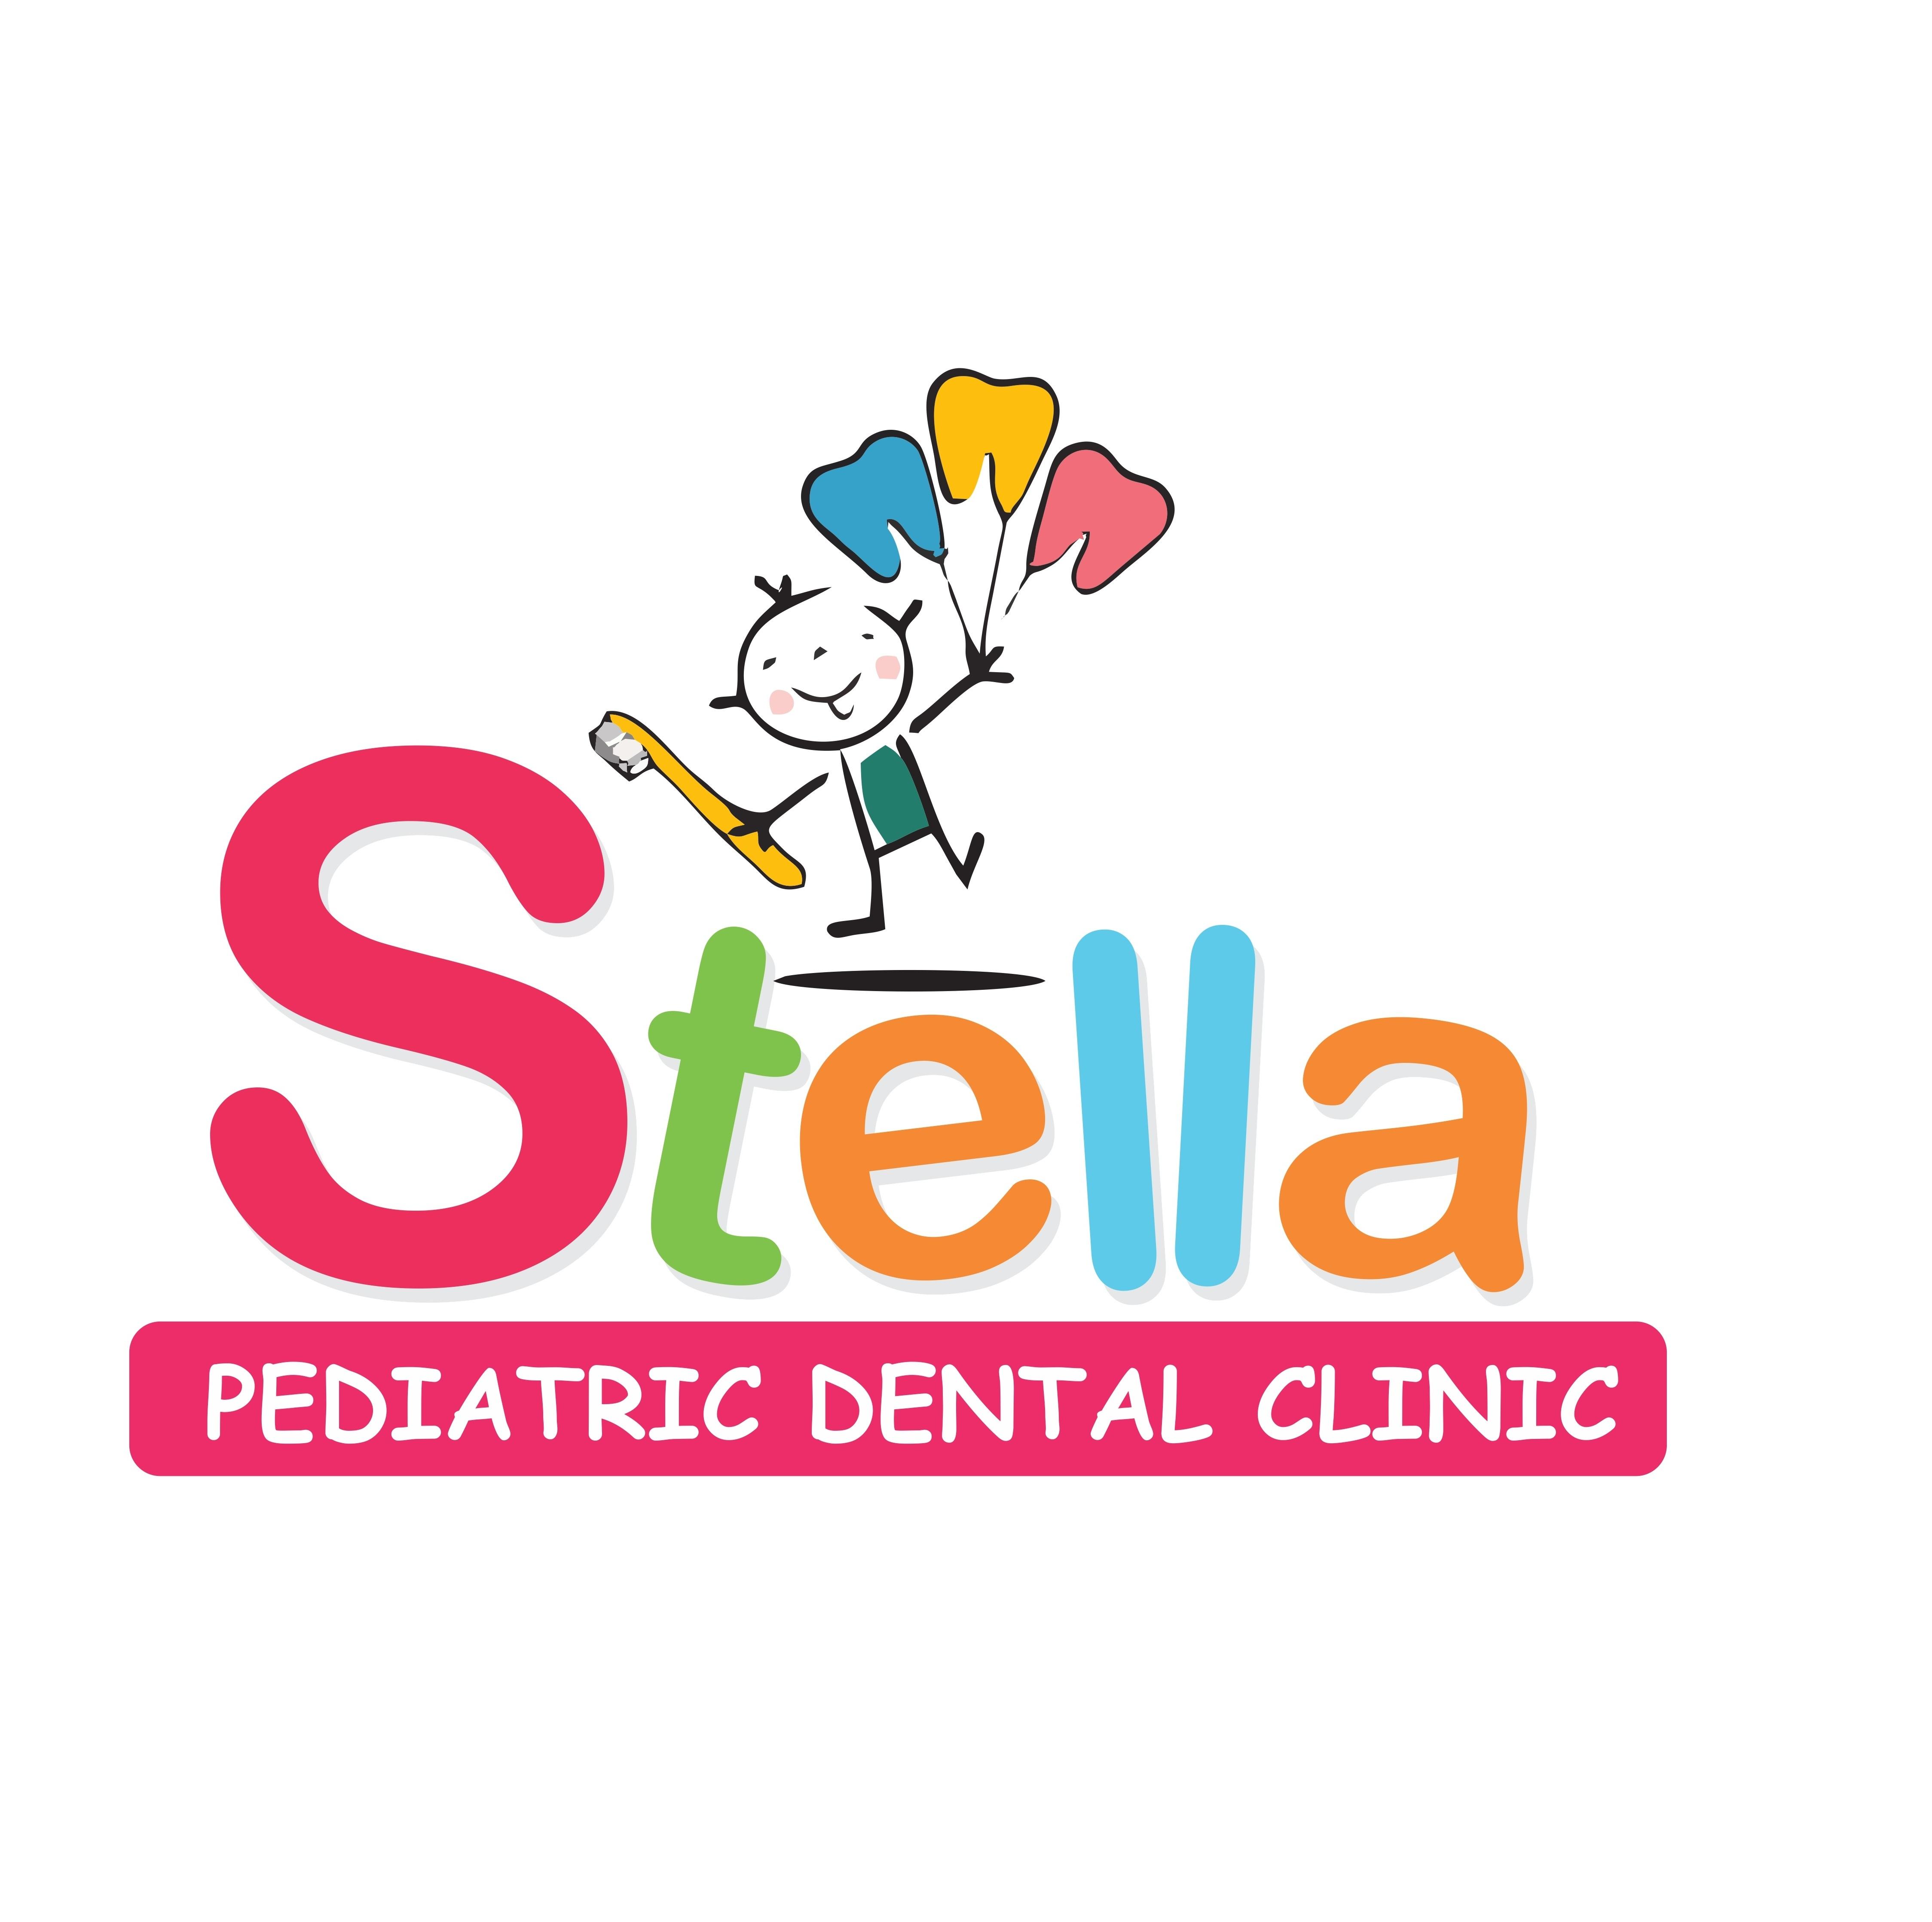 Stella Pediatric Dental Clinic